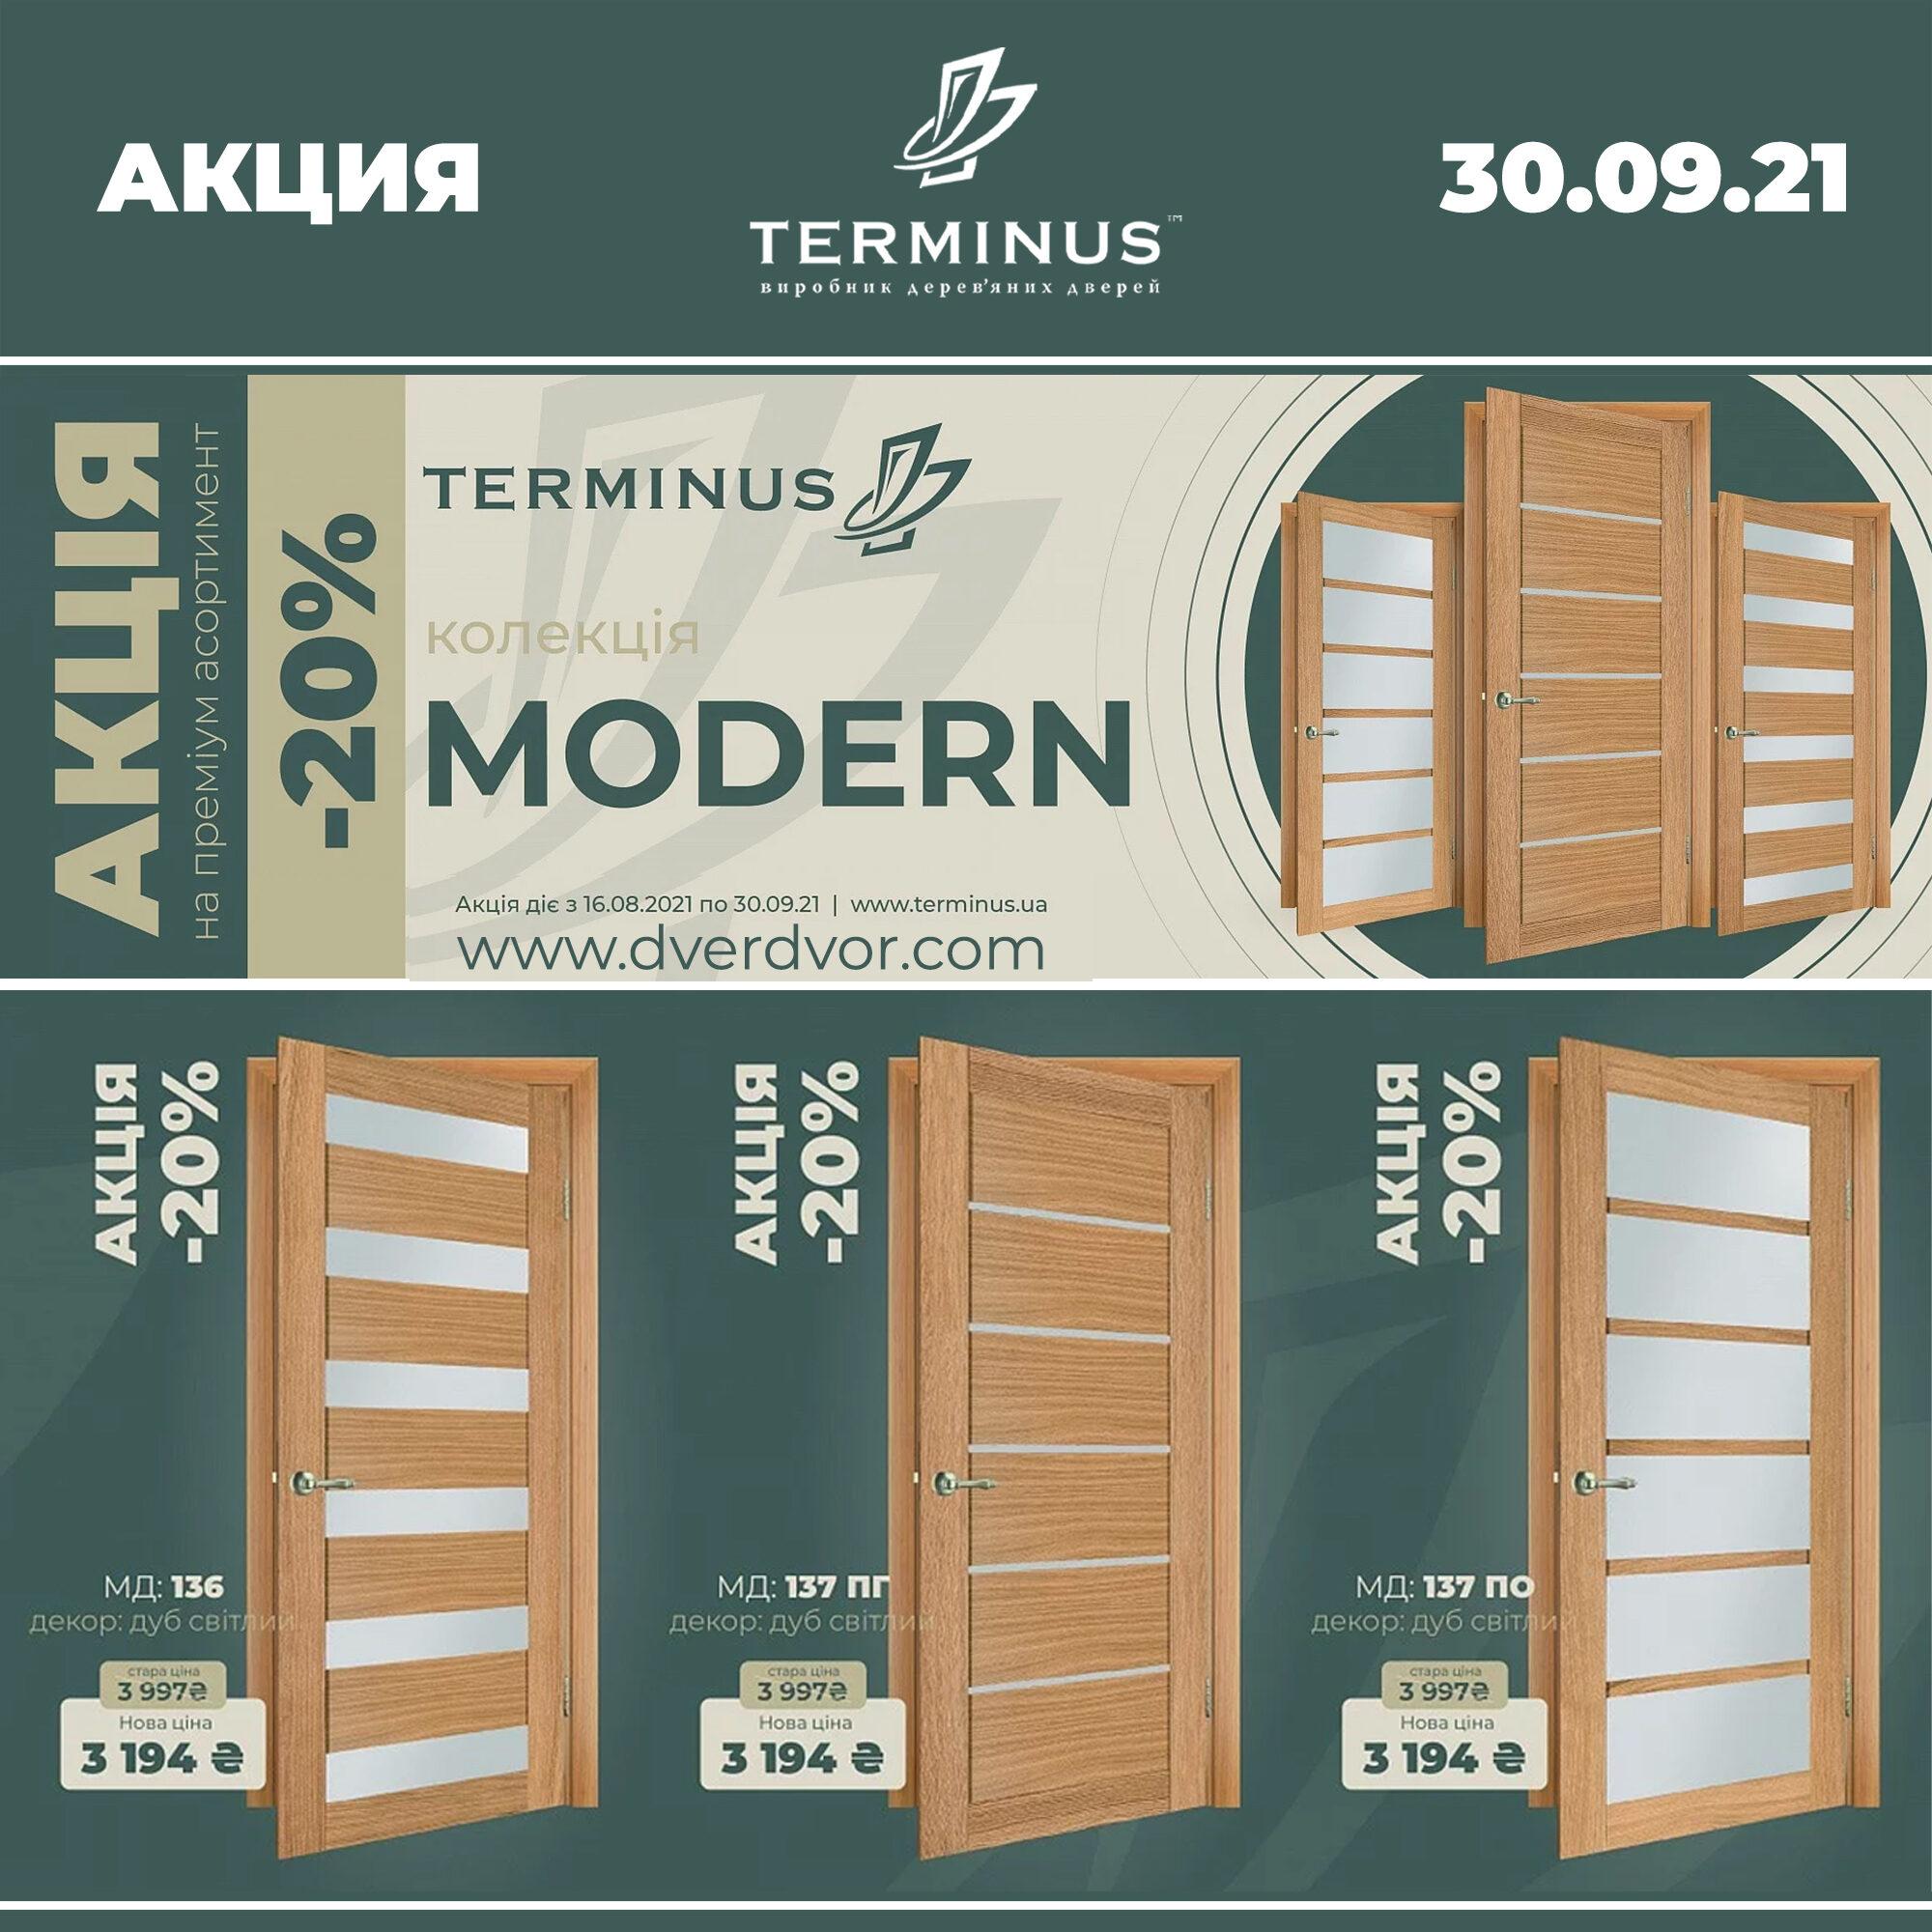 30.09.2021 Terminus Modern